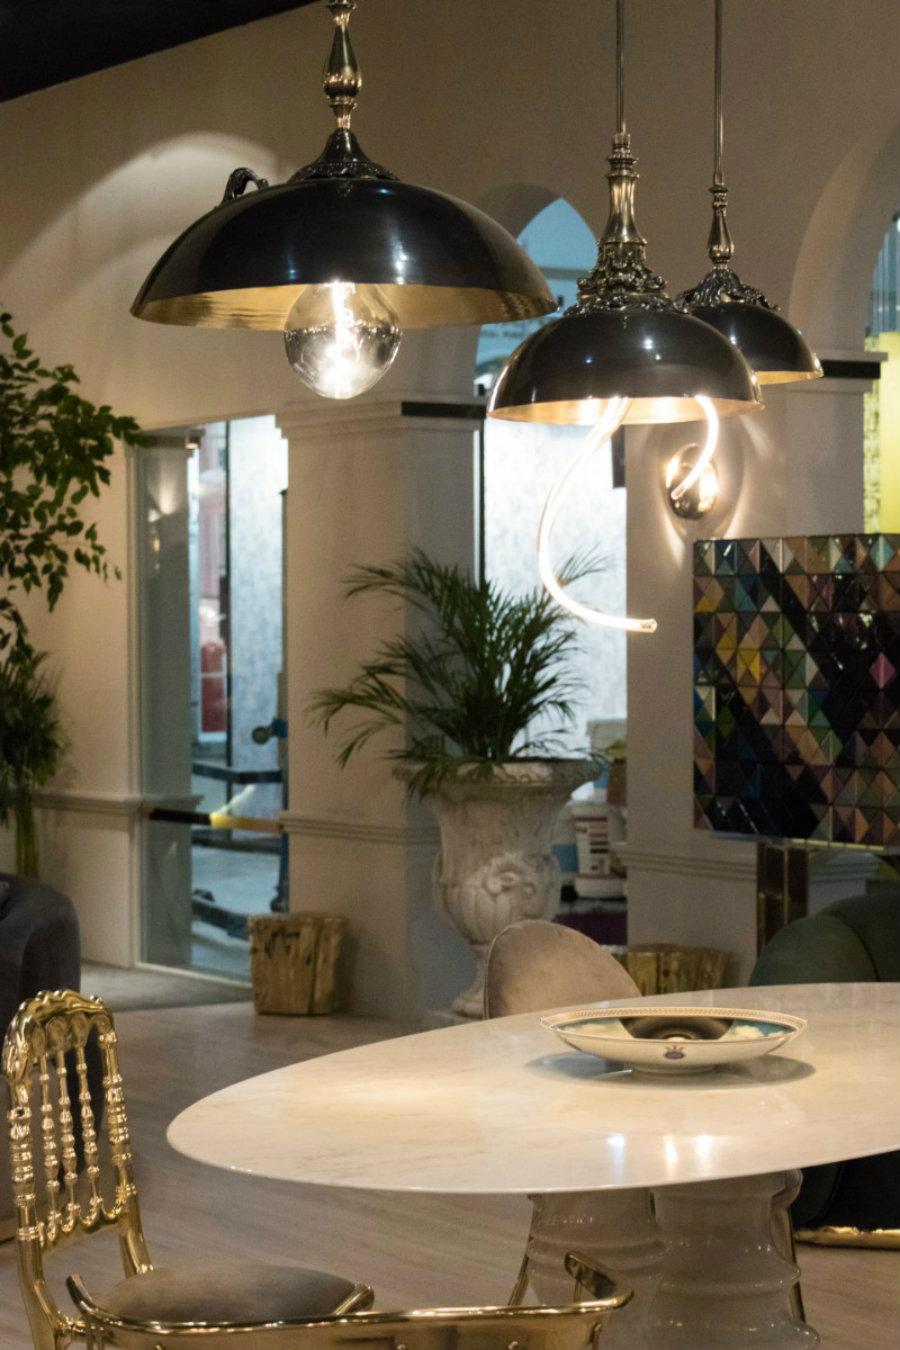 milan design week Milan Design Week: a preview of Boca do Lobo's showcase triptico